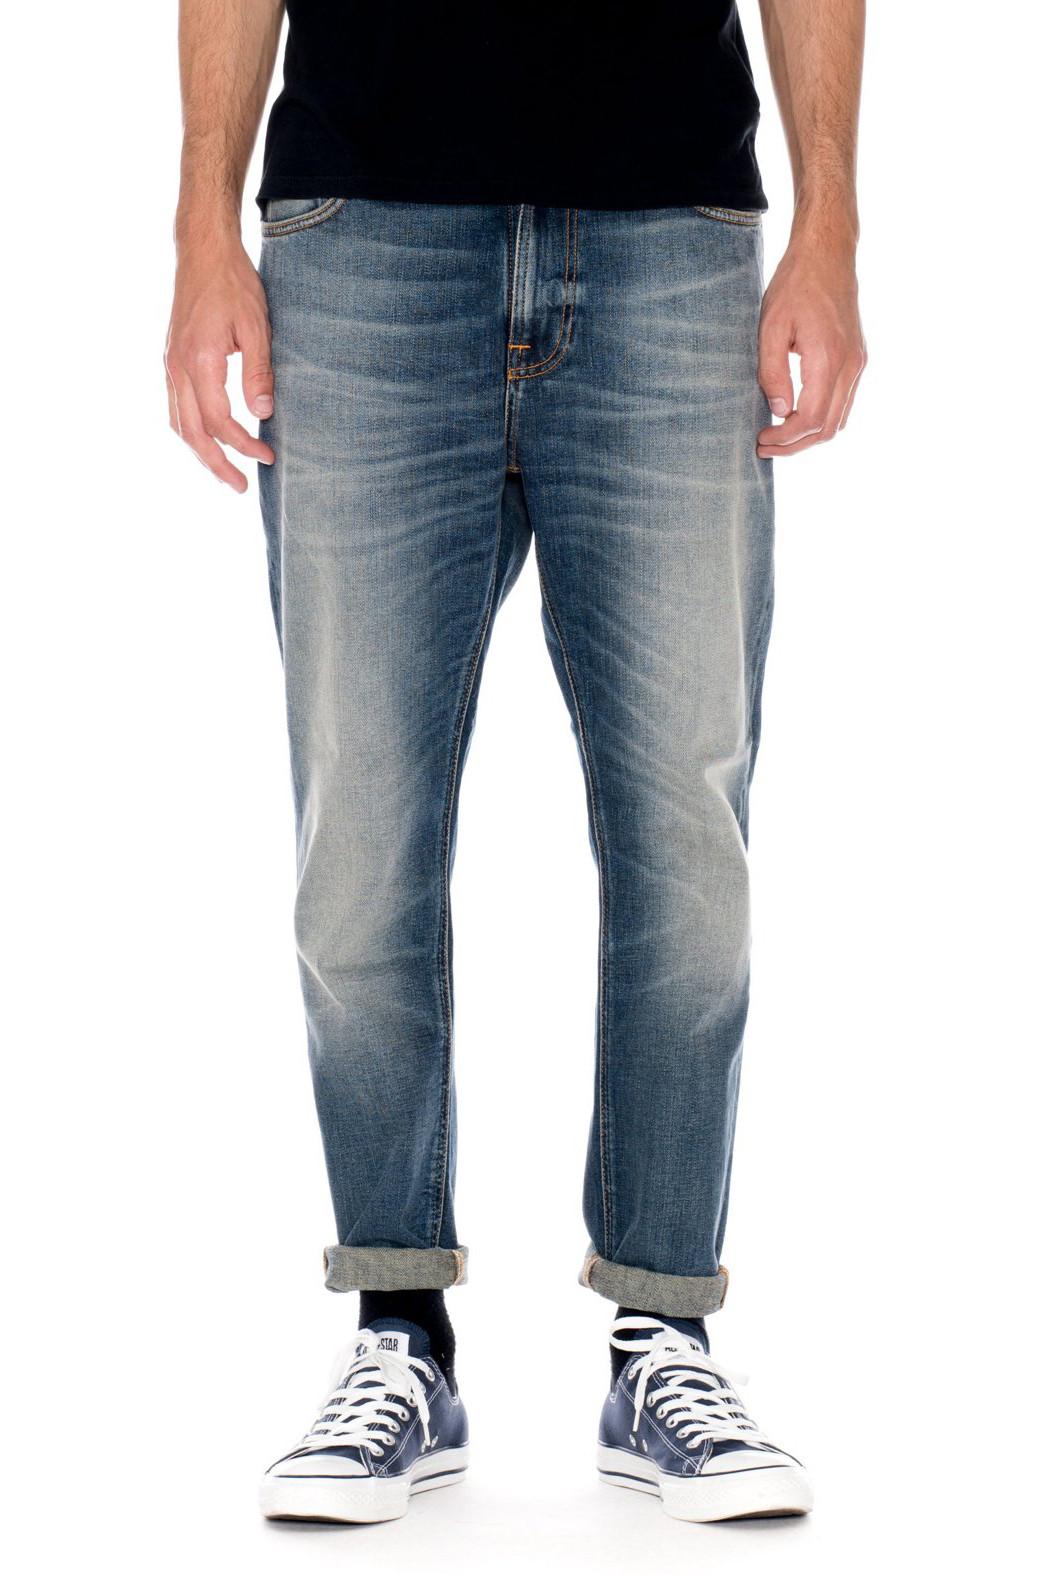 nudie jeans brute knut blue hike garmentory. Black Bedroom Furniture Sets. Home Design Ideas